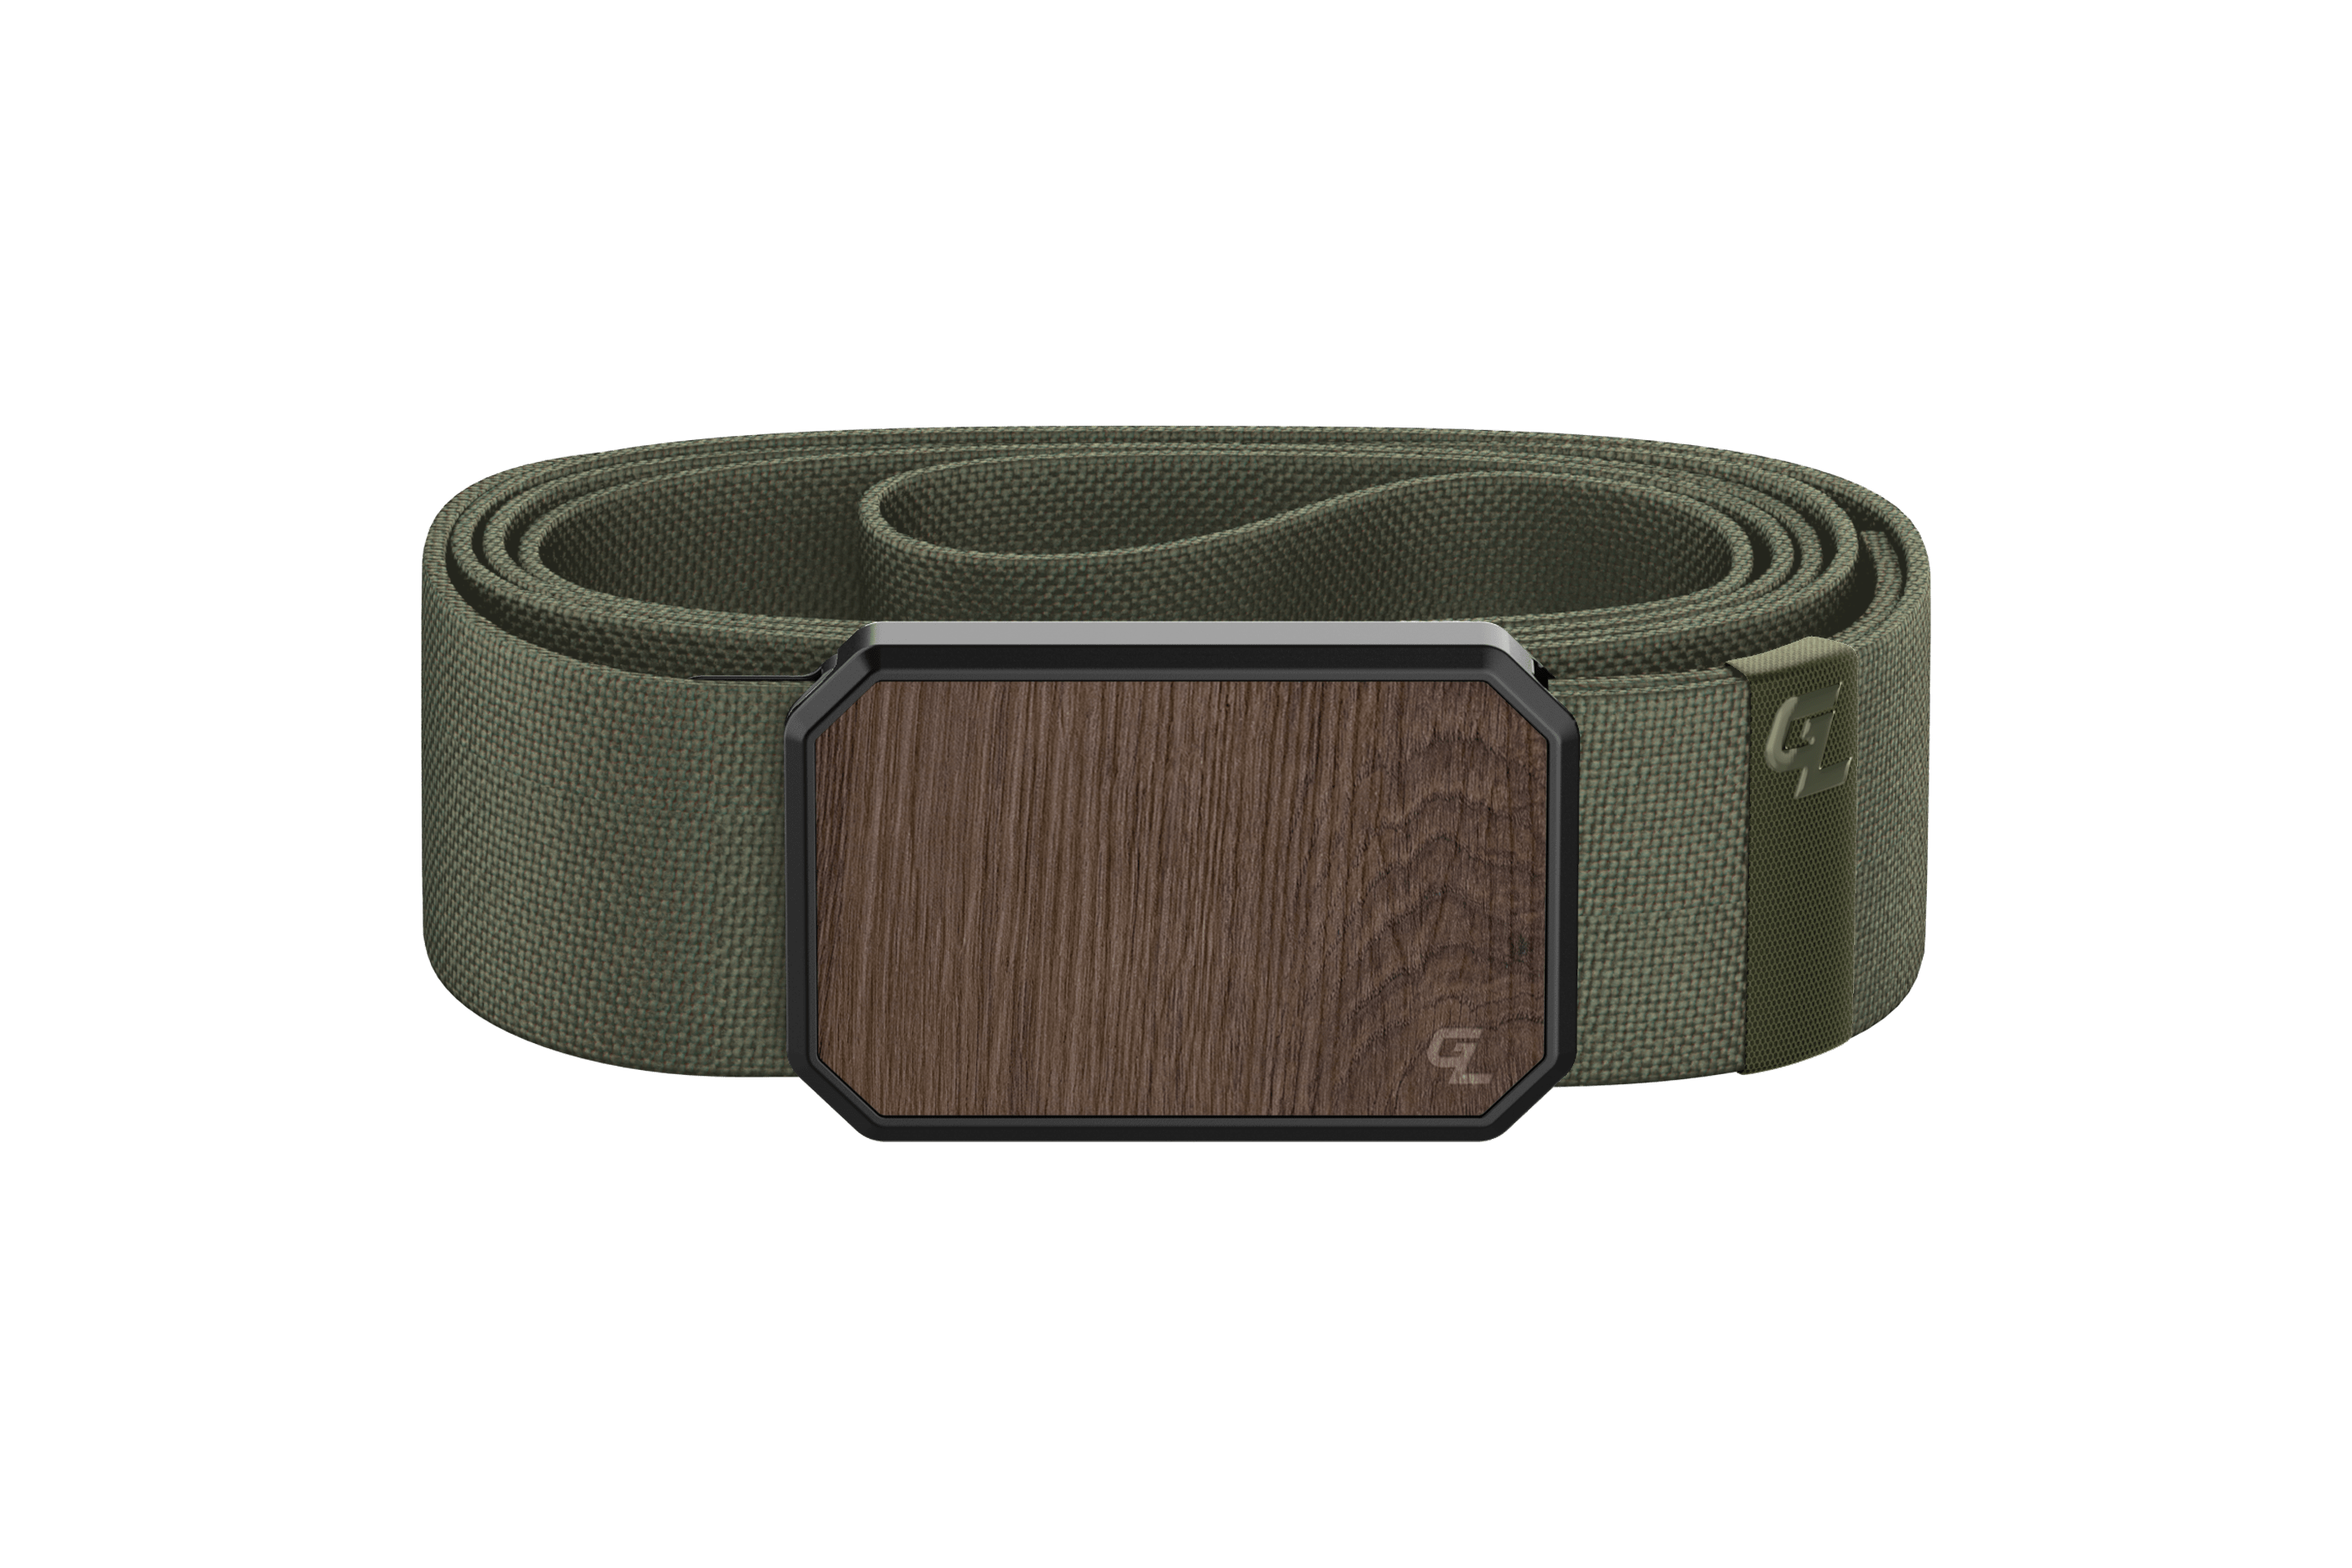 Groove Belt Walnut/Olive  viewed front on